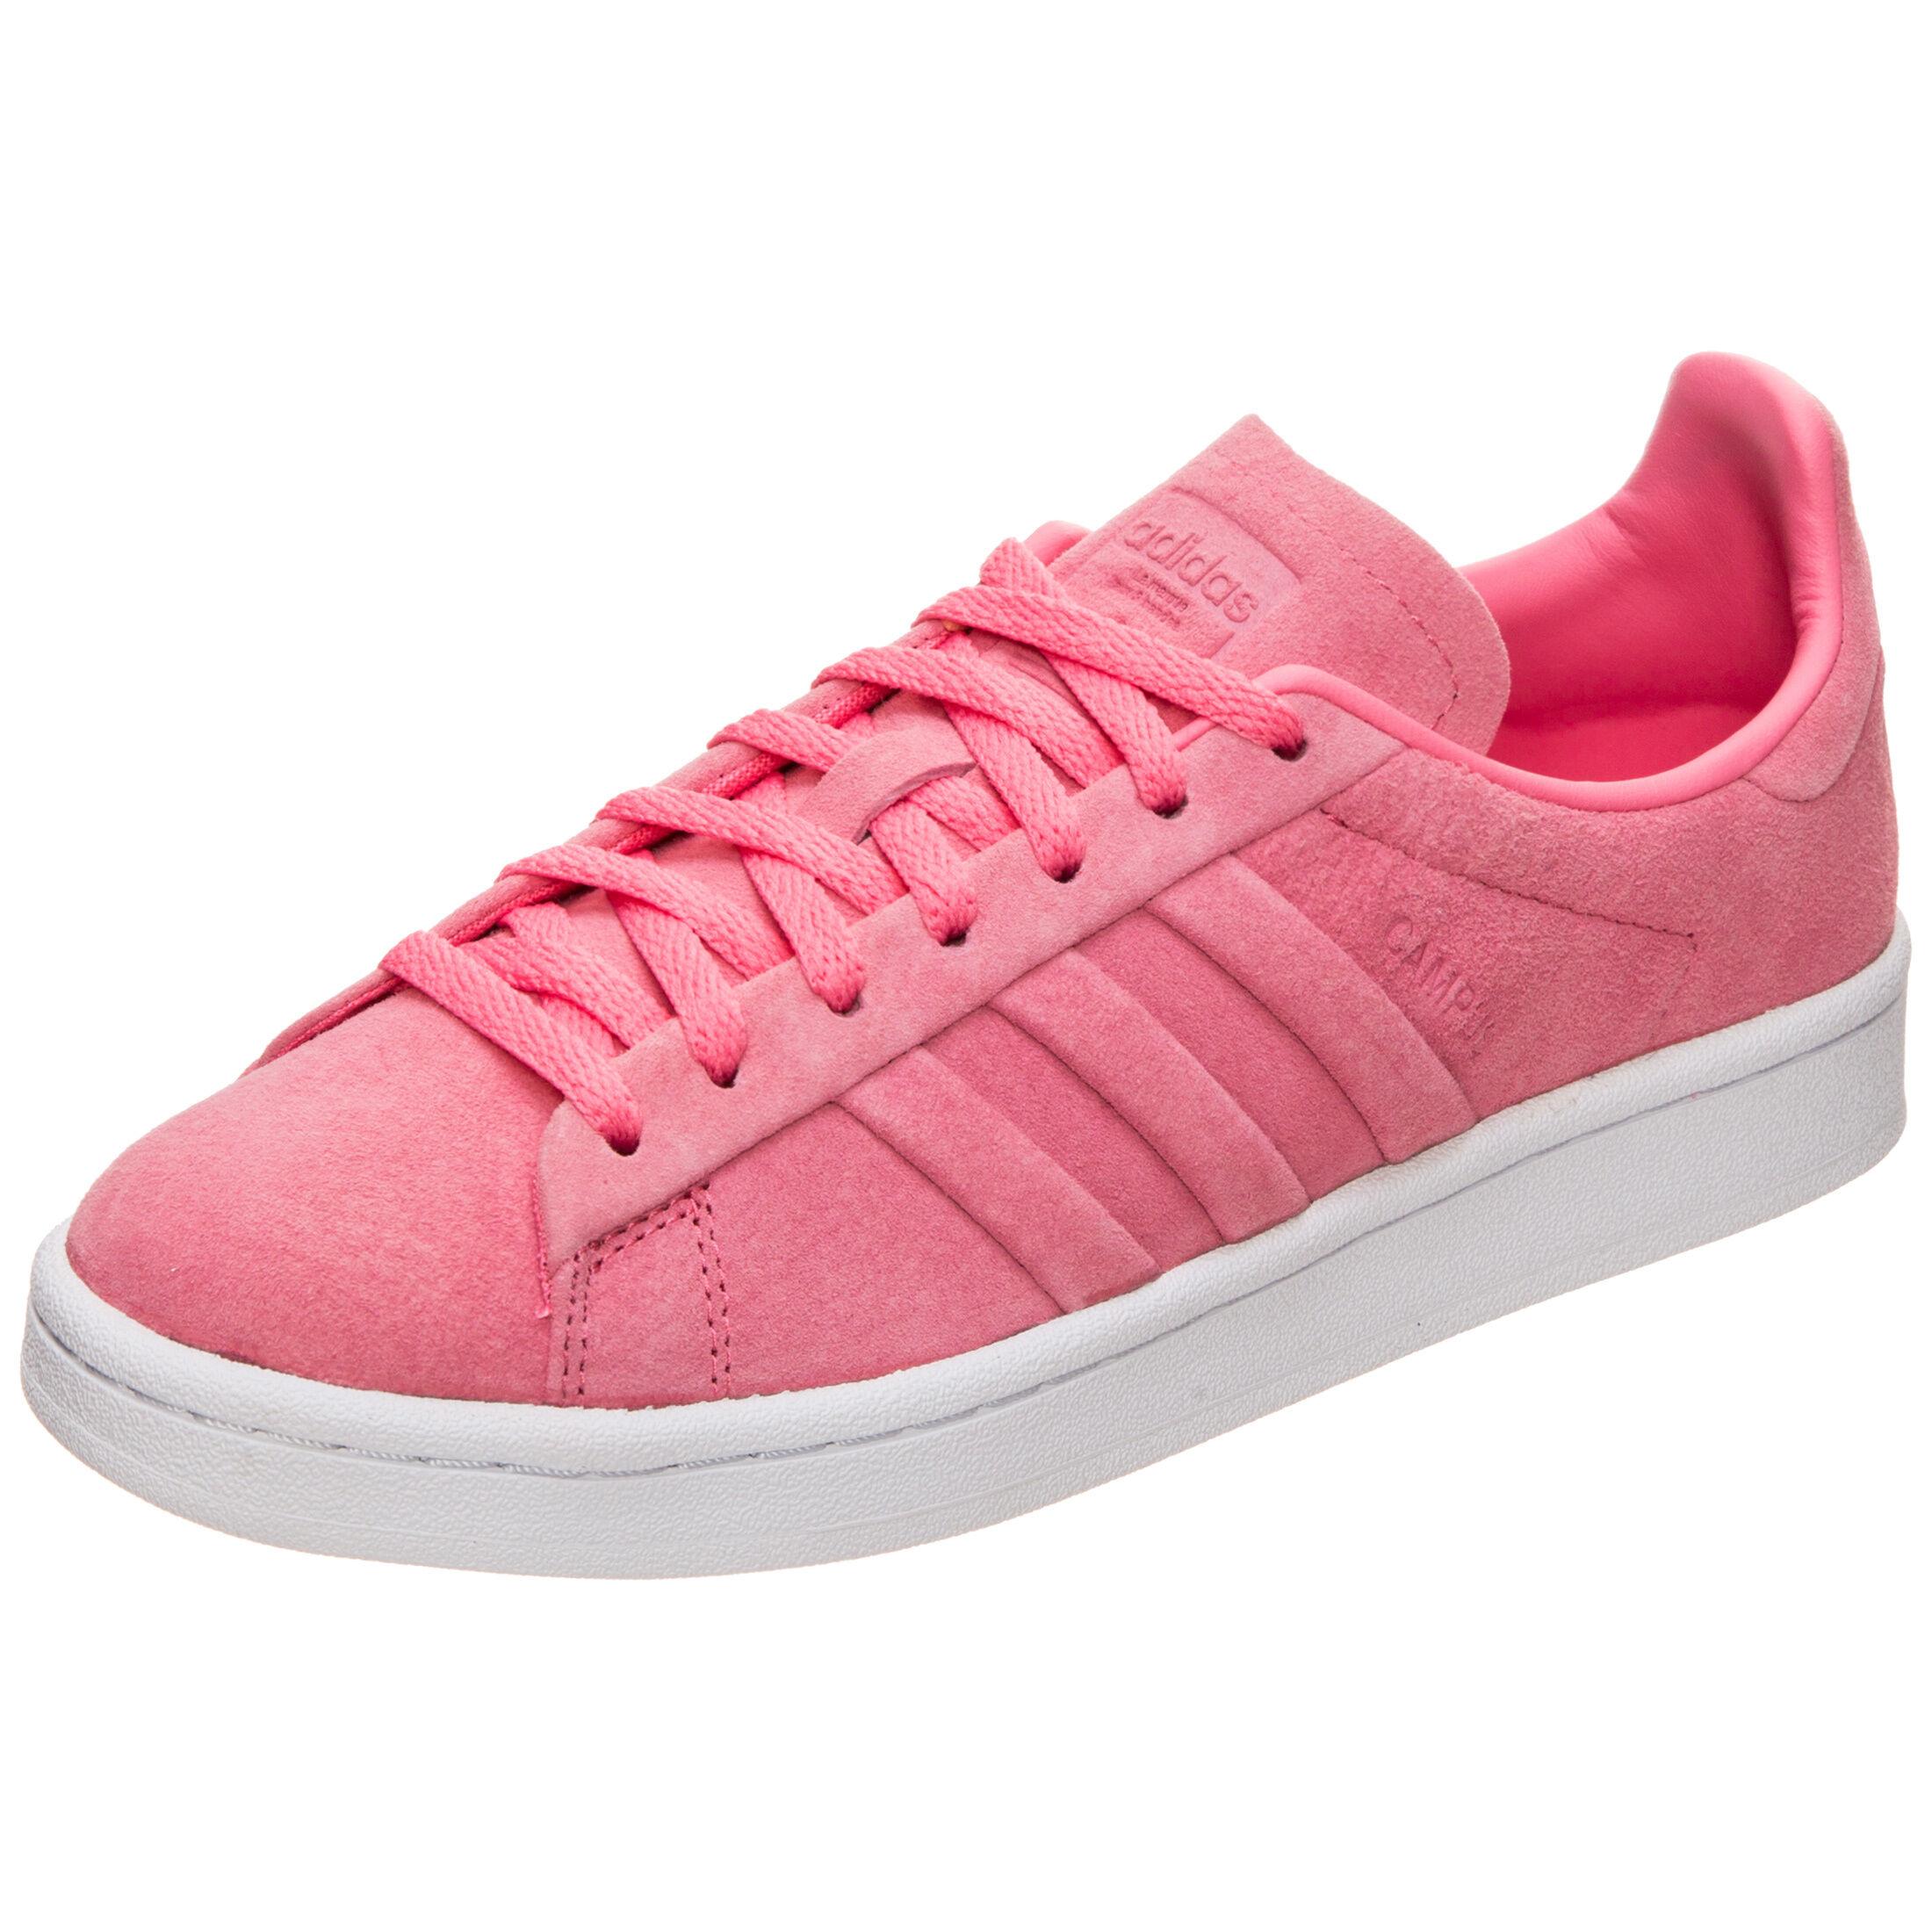 Schuhe adidas Originals   Frauen Lifestyle bei OUTFITTER